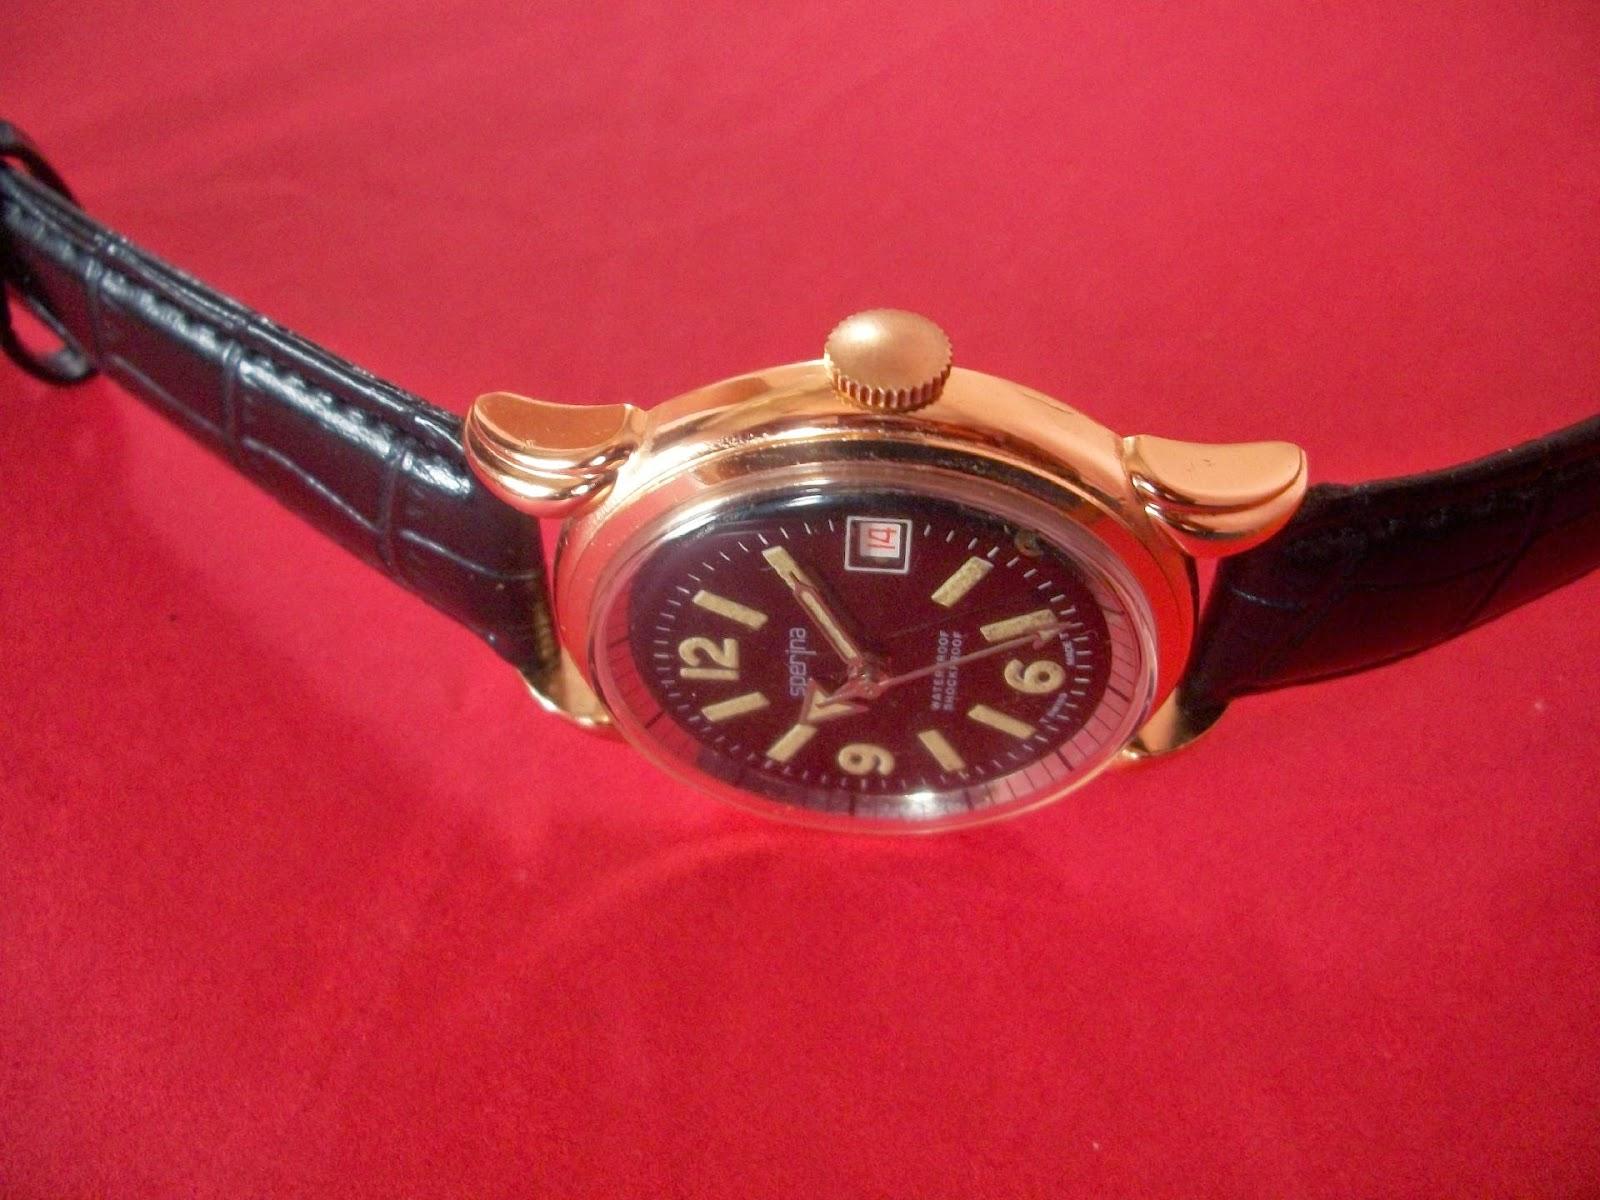 Vintage SPERINA Manual Winding Watch